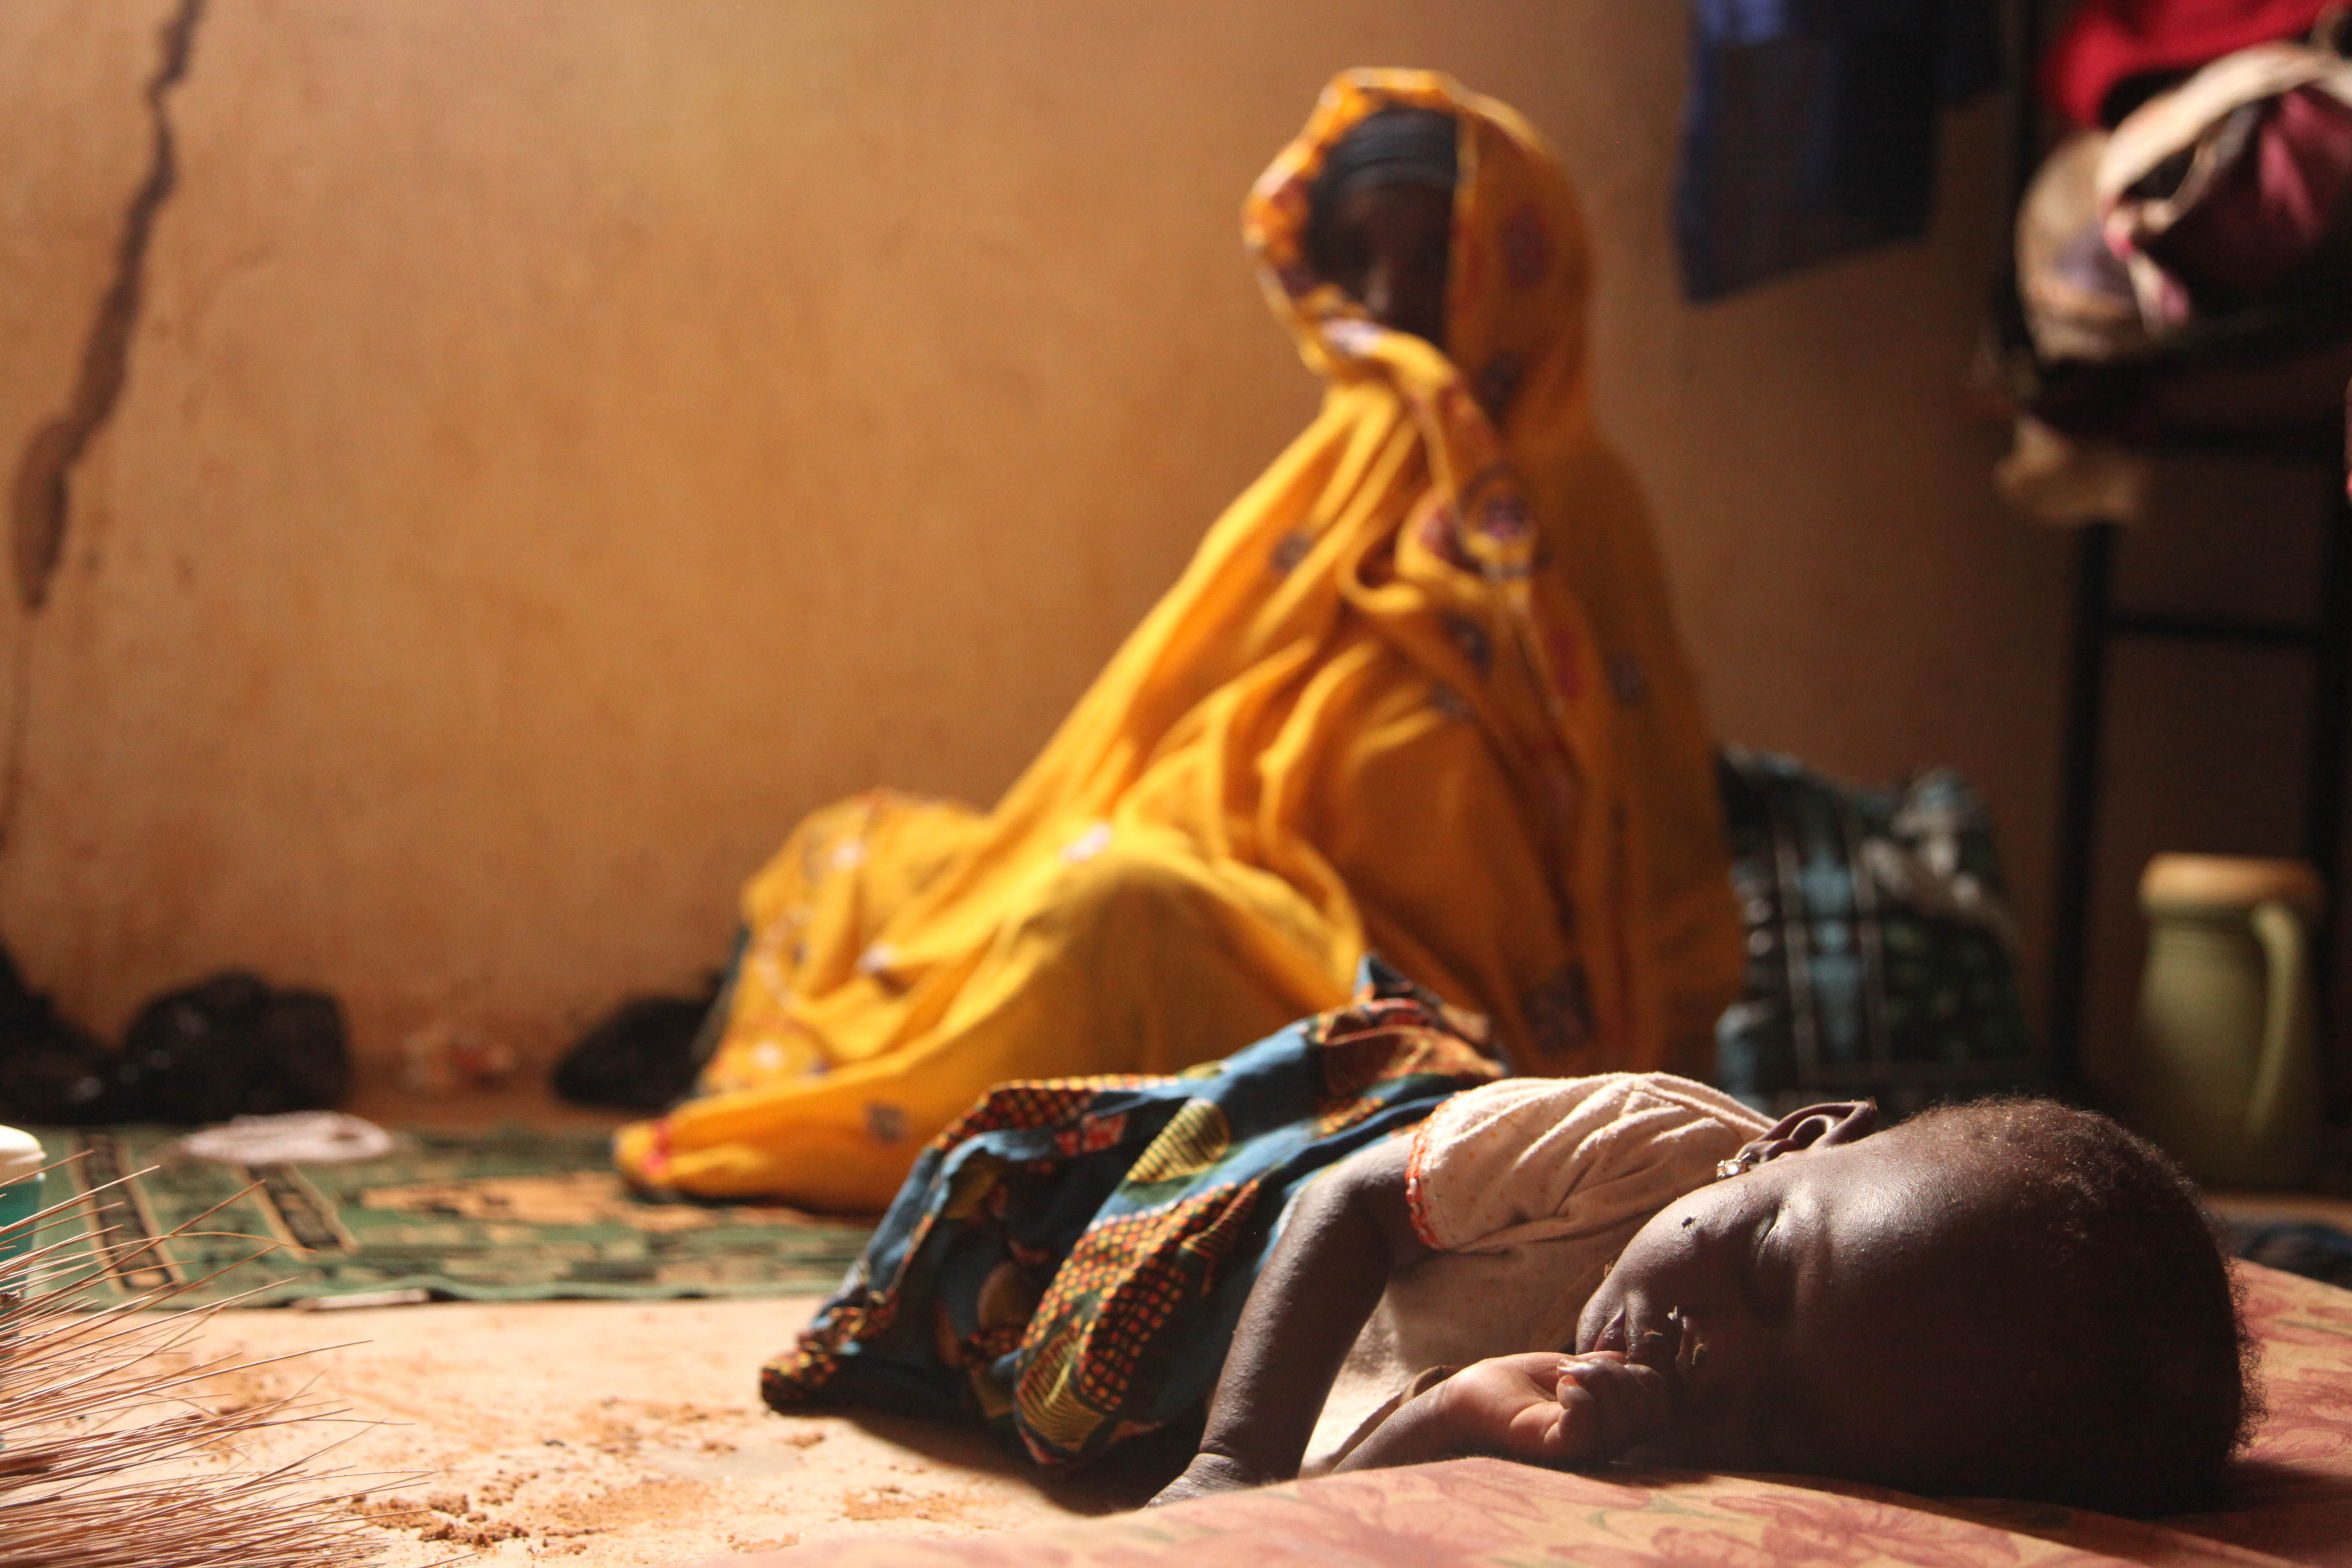 Niger Flooding 2010 - Lake Chad Basin